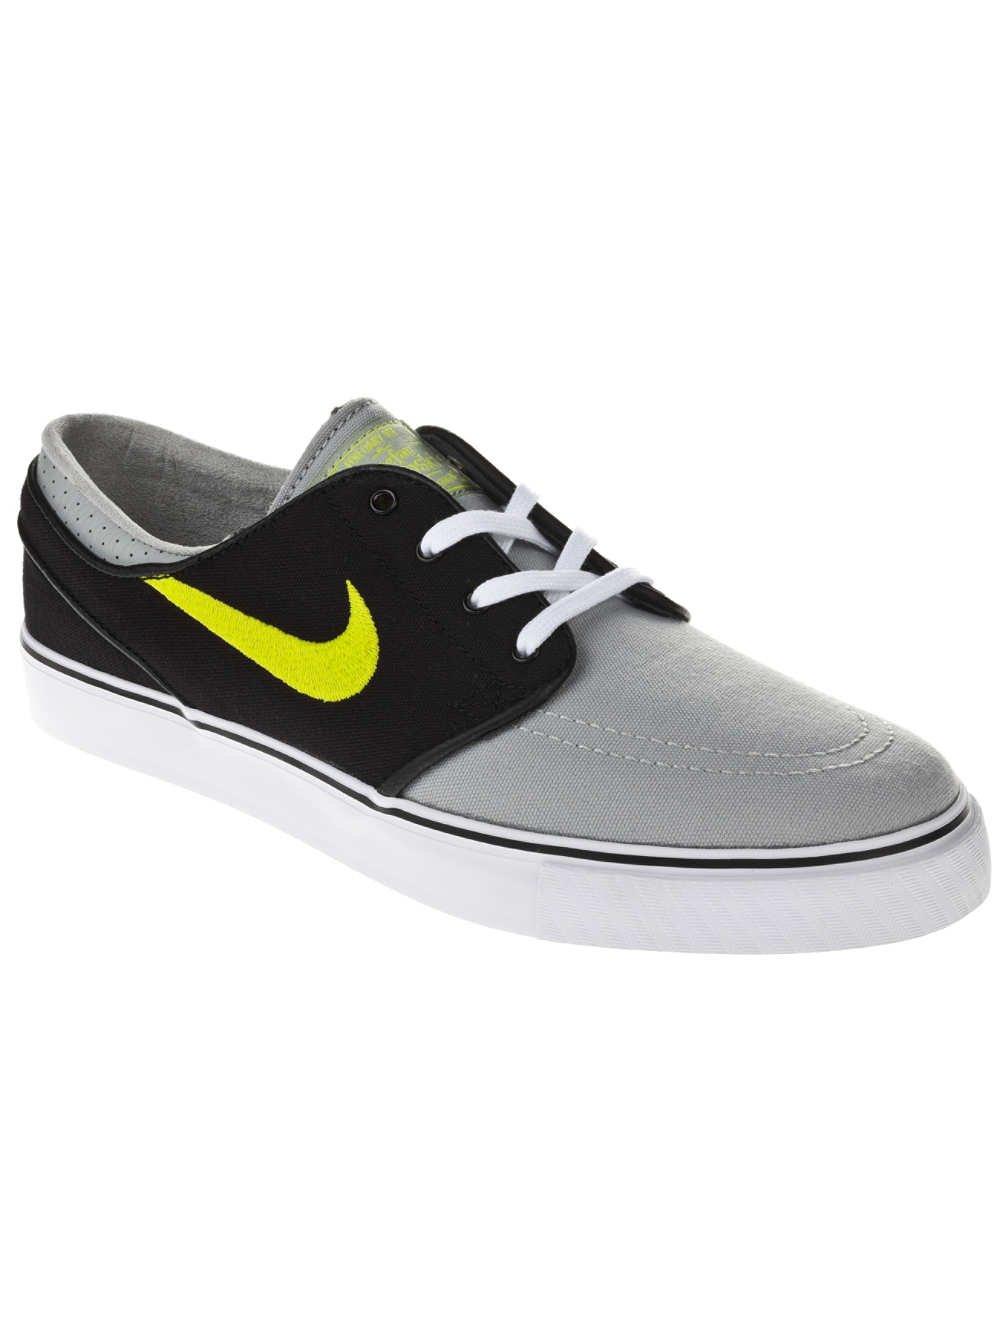 Herren Skateschuh Nike Zoom Zoom Zoom Stefan Janoski Canvas Skateschuhe 84b84b